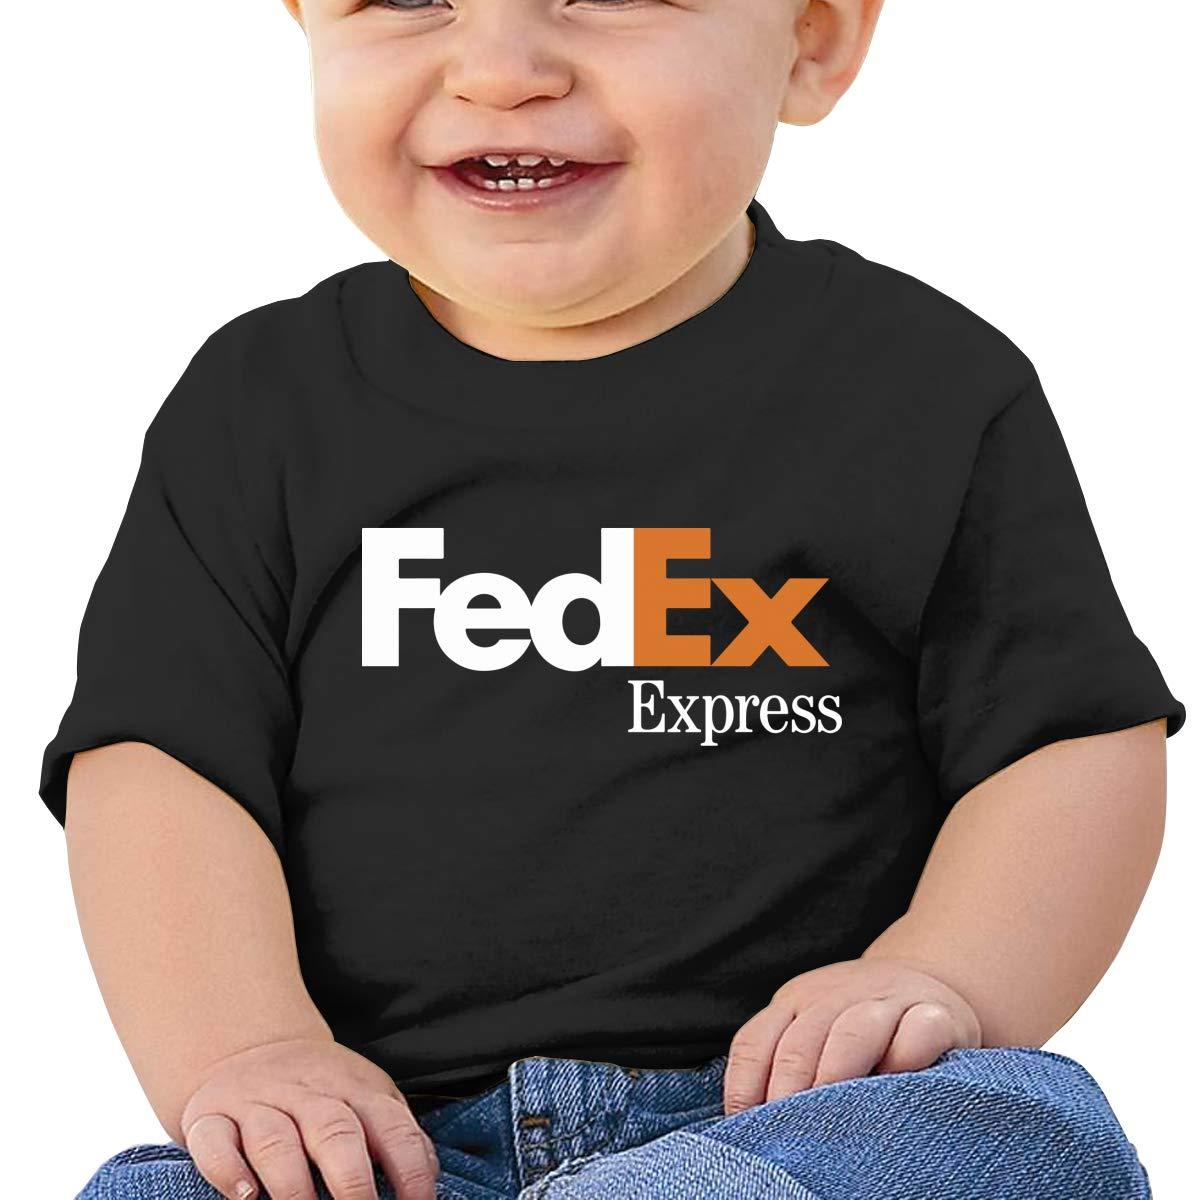 Kangtians Baby FedEx-Express Shirt Toddler Cotton Tee